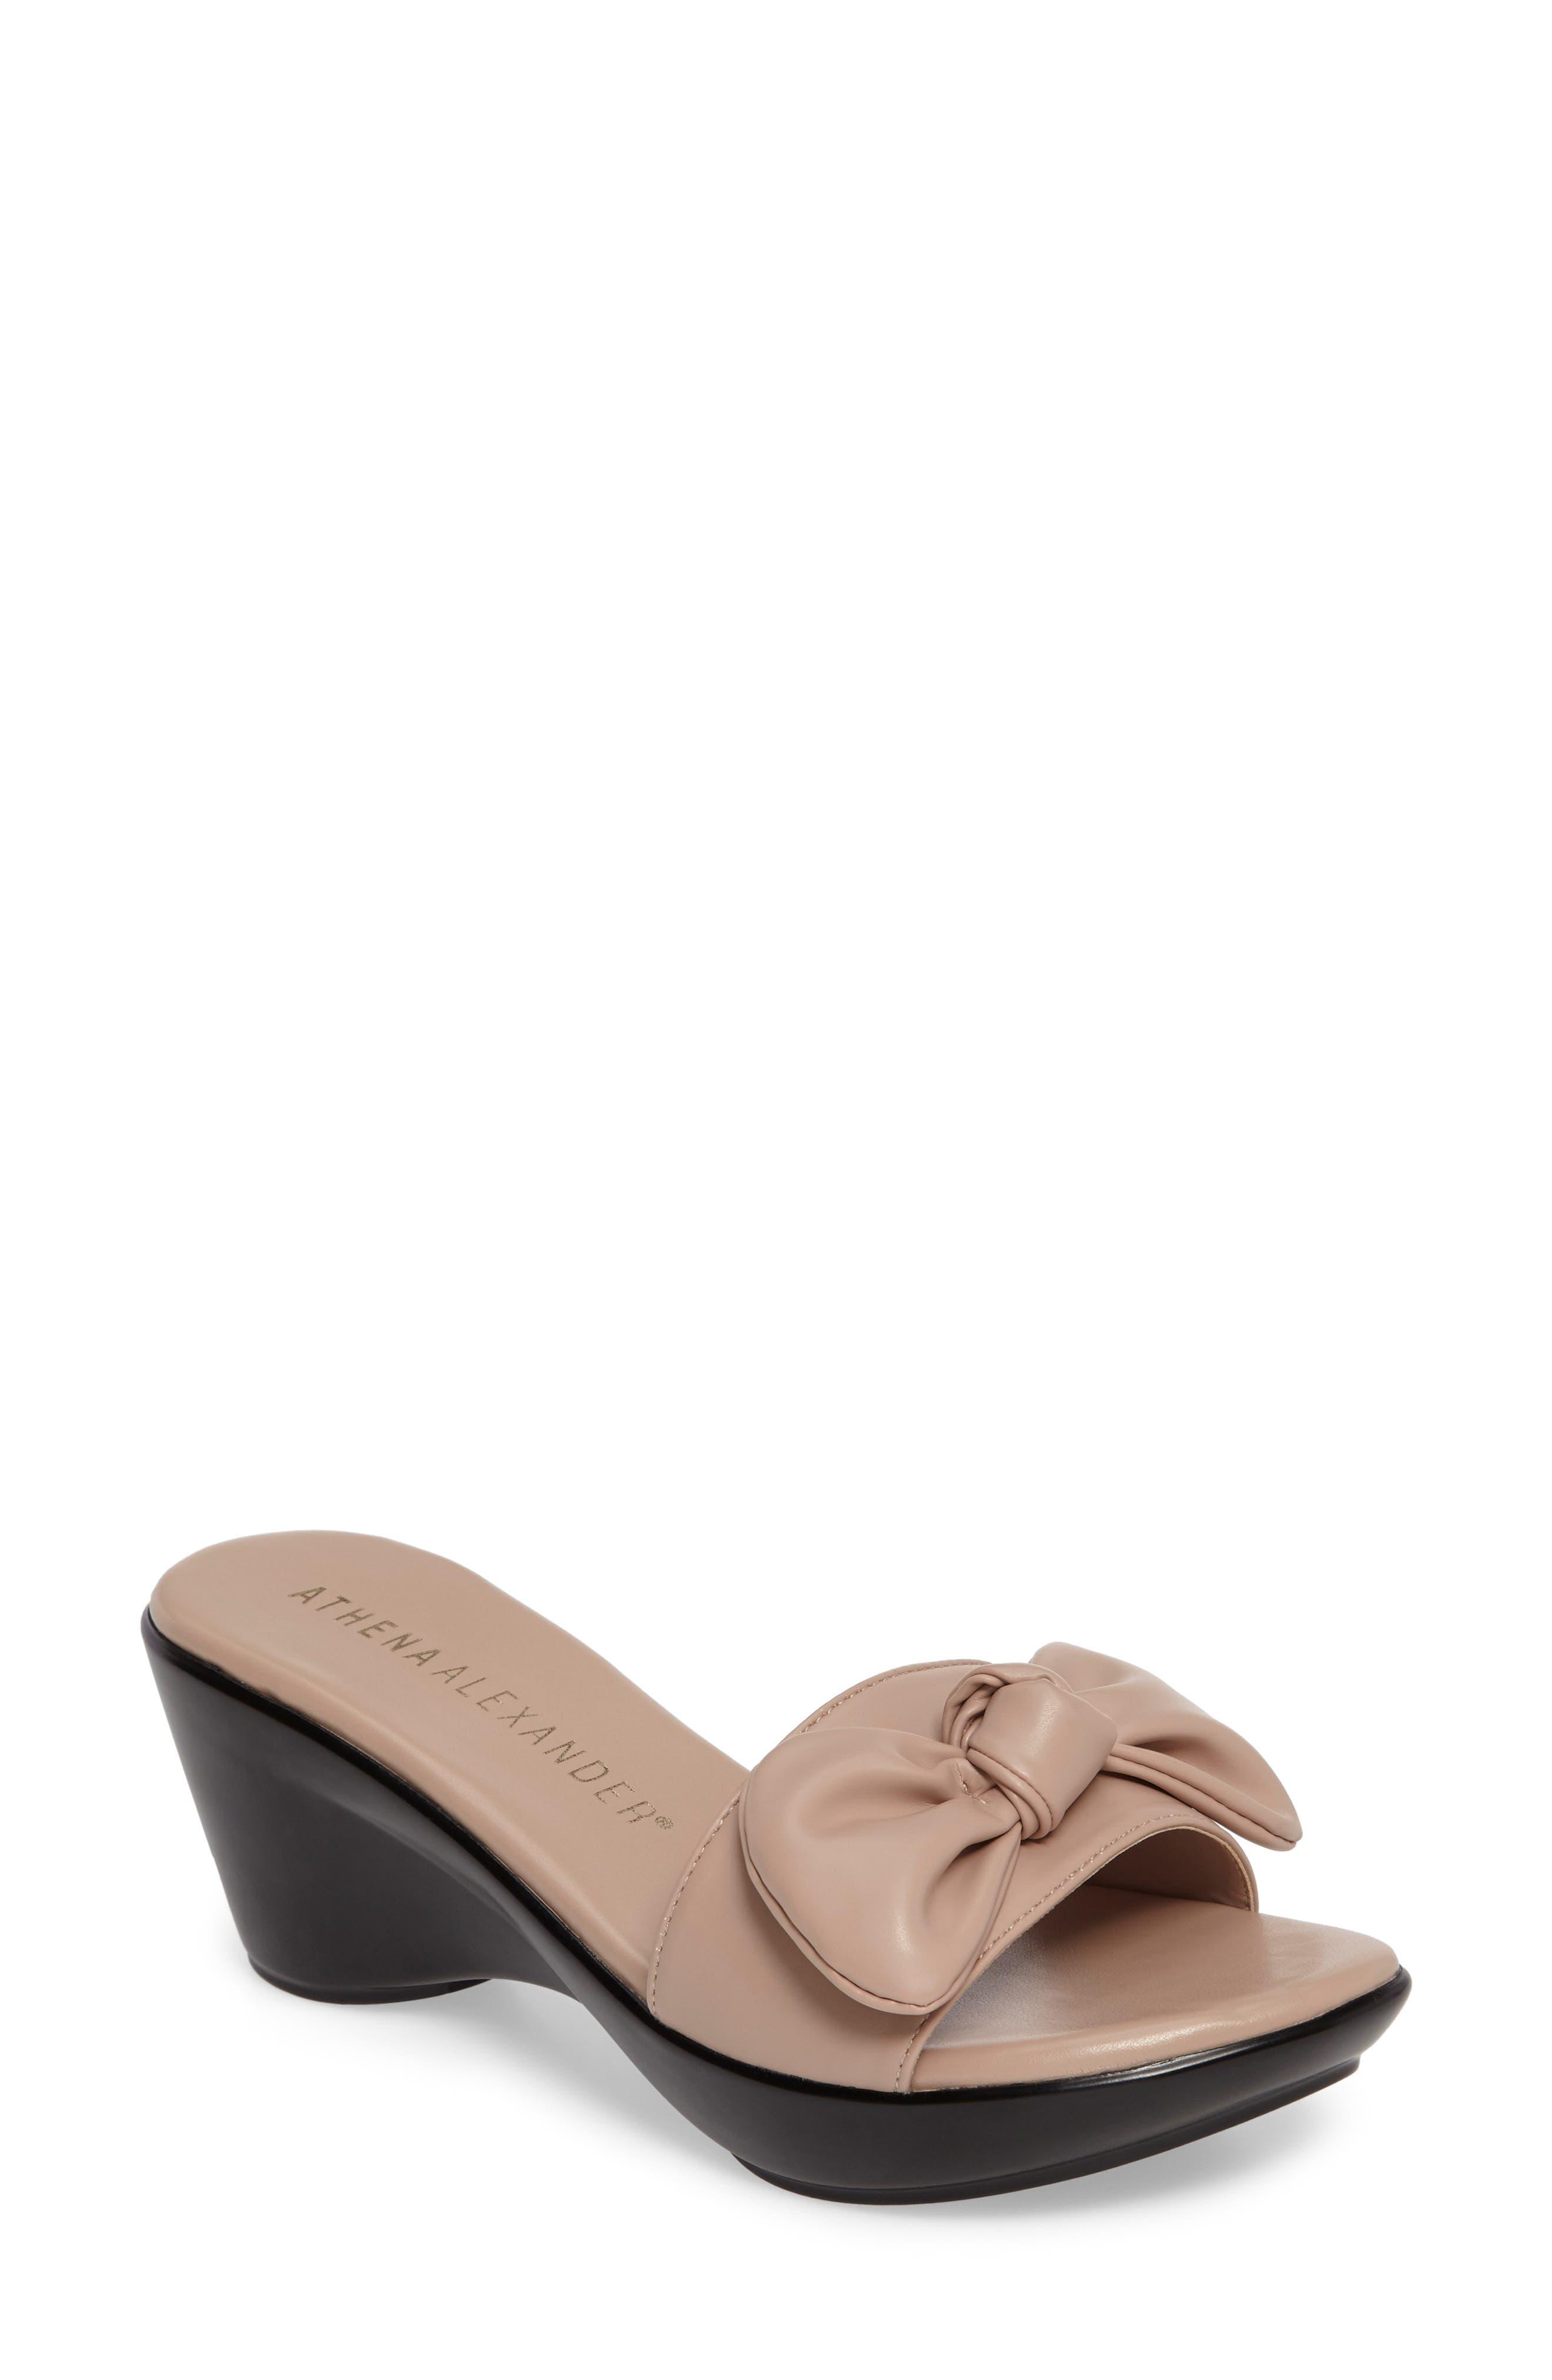 Pattye Knotted Slide Sandal,                             Main thumbnail 1, color,                             Blush Faux Leather